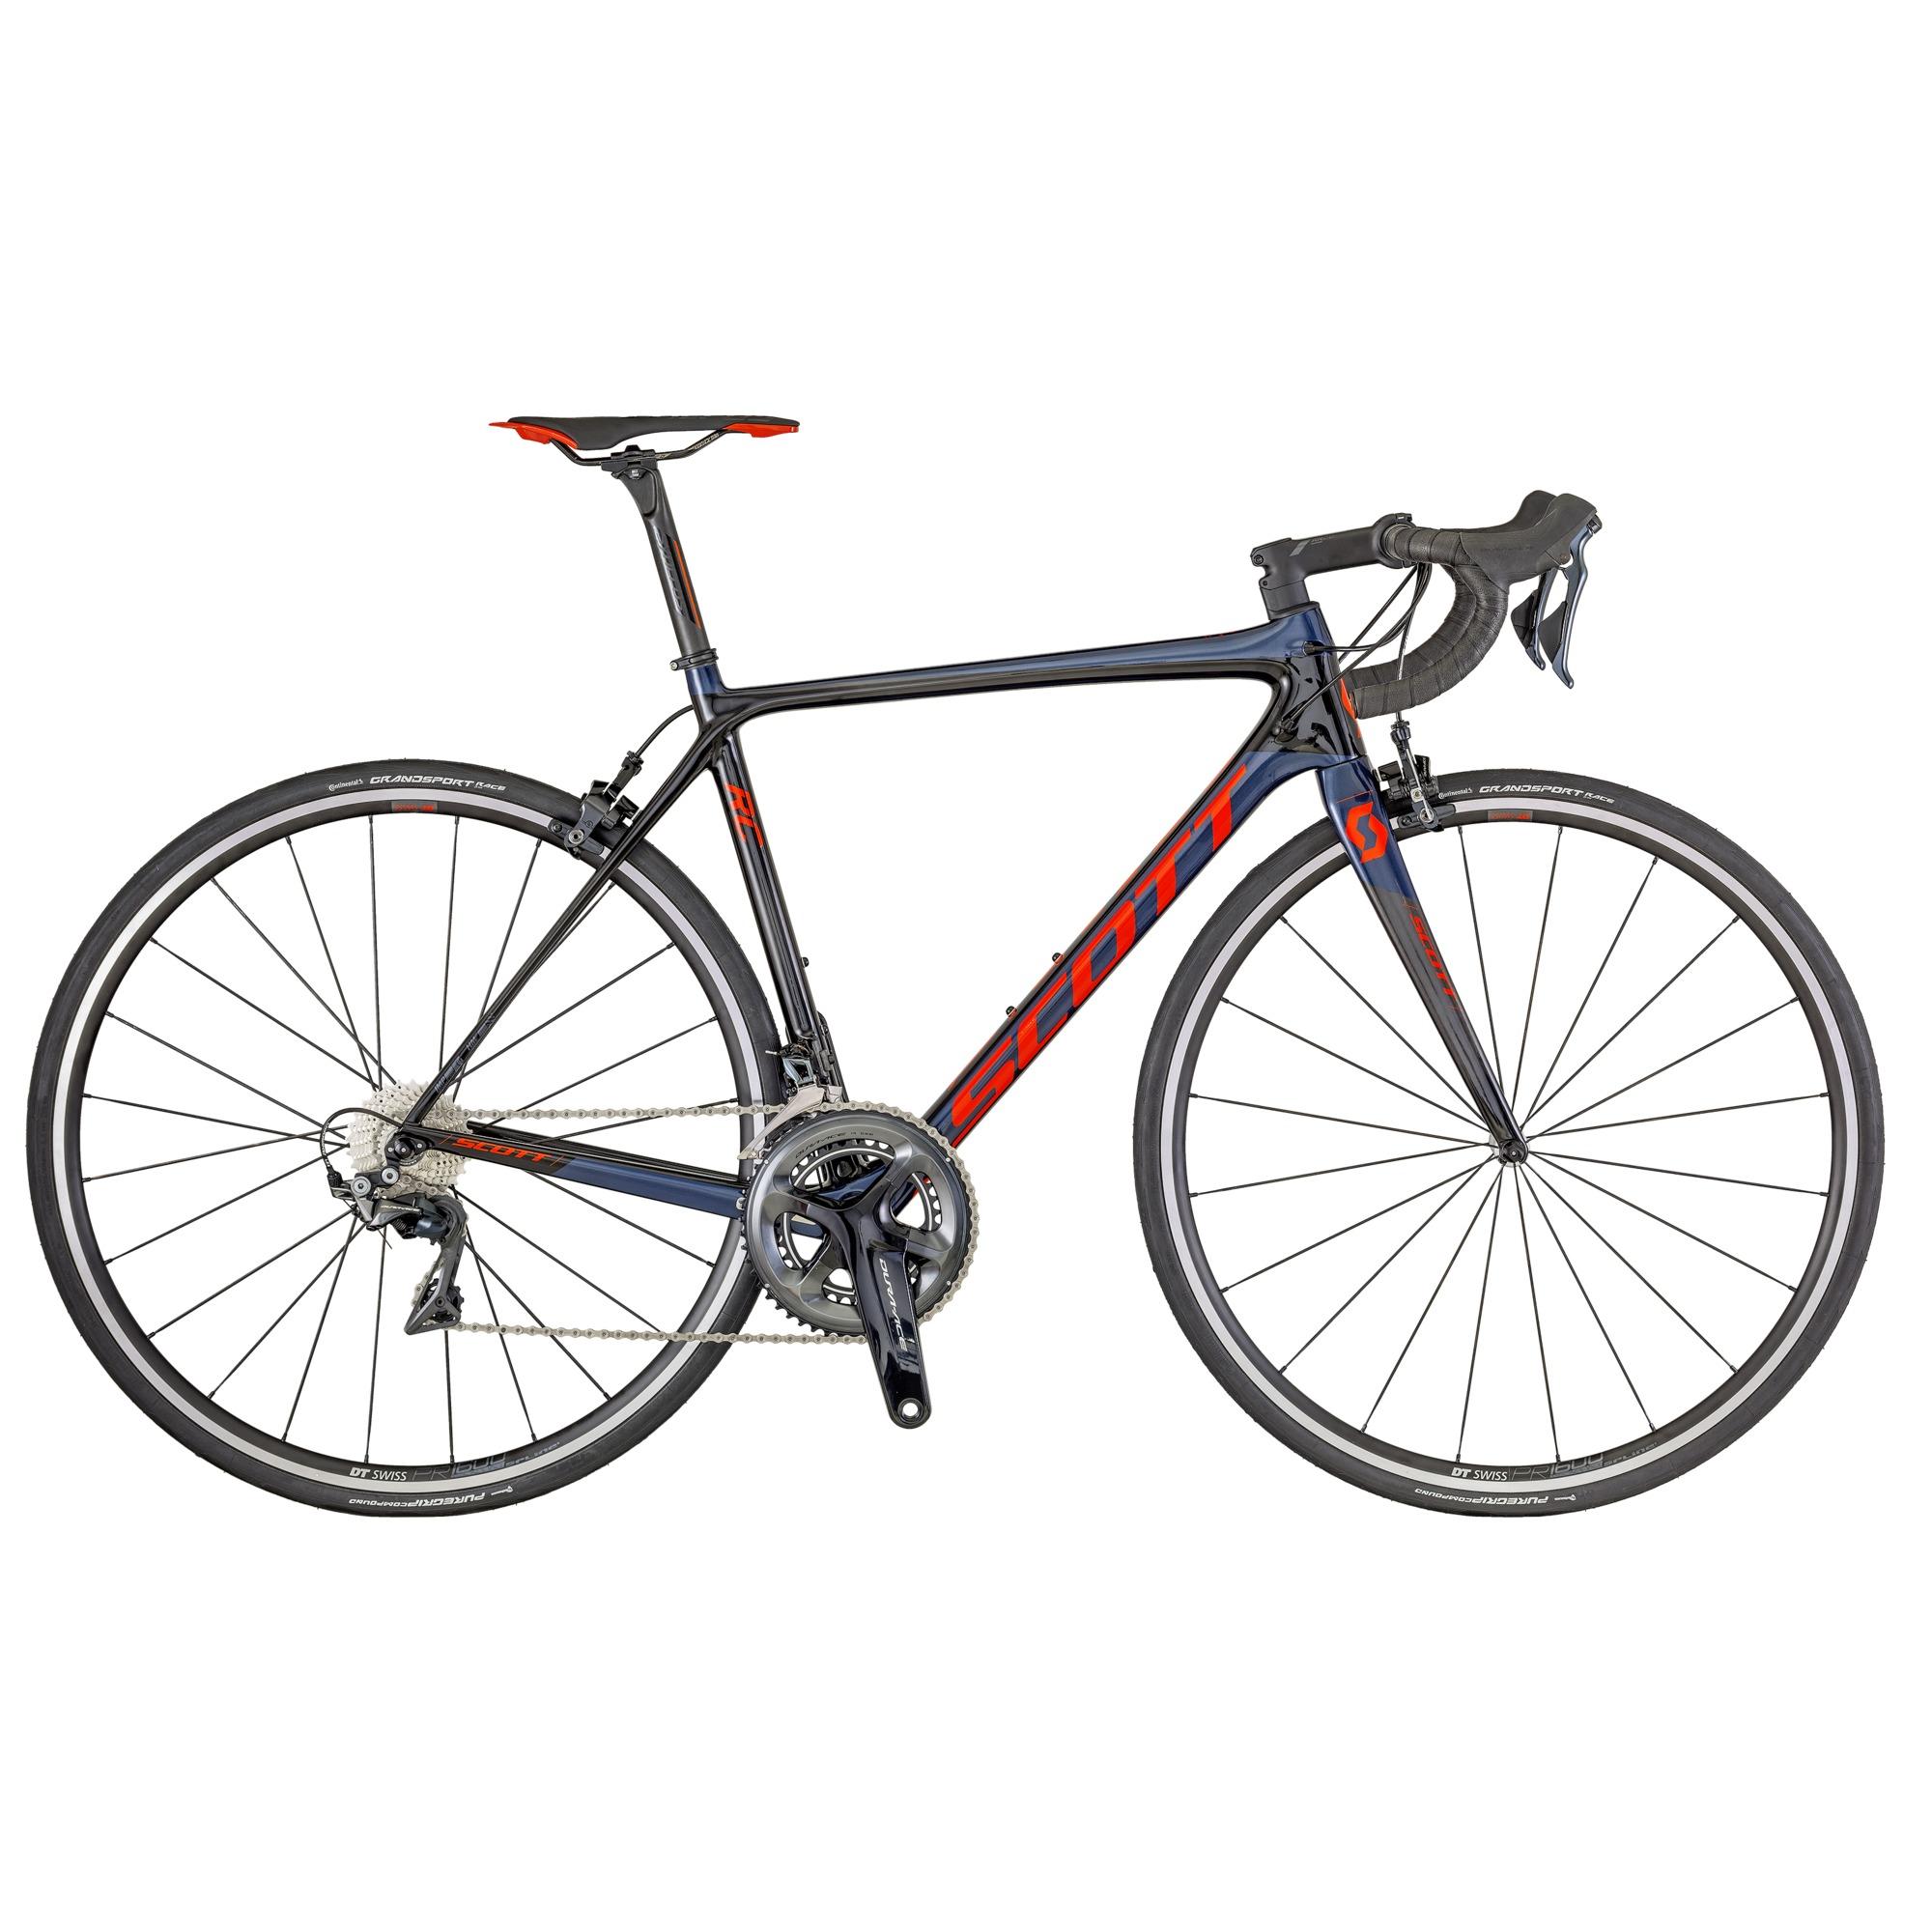 SCOTT Addict RC 10 Bike 2XL61 - Zweirad Homann